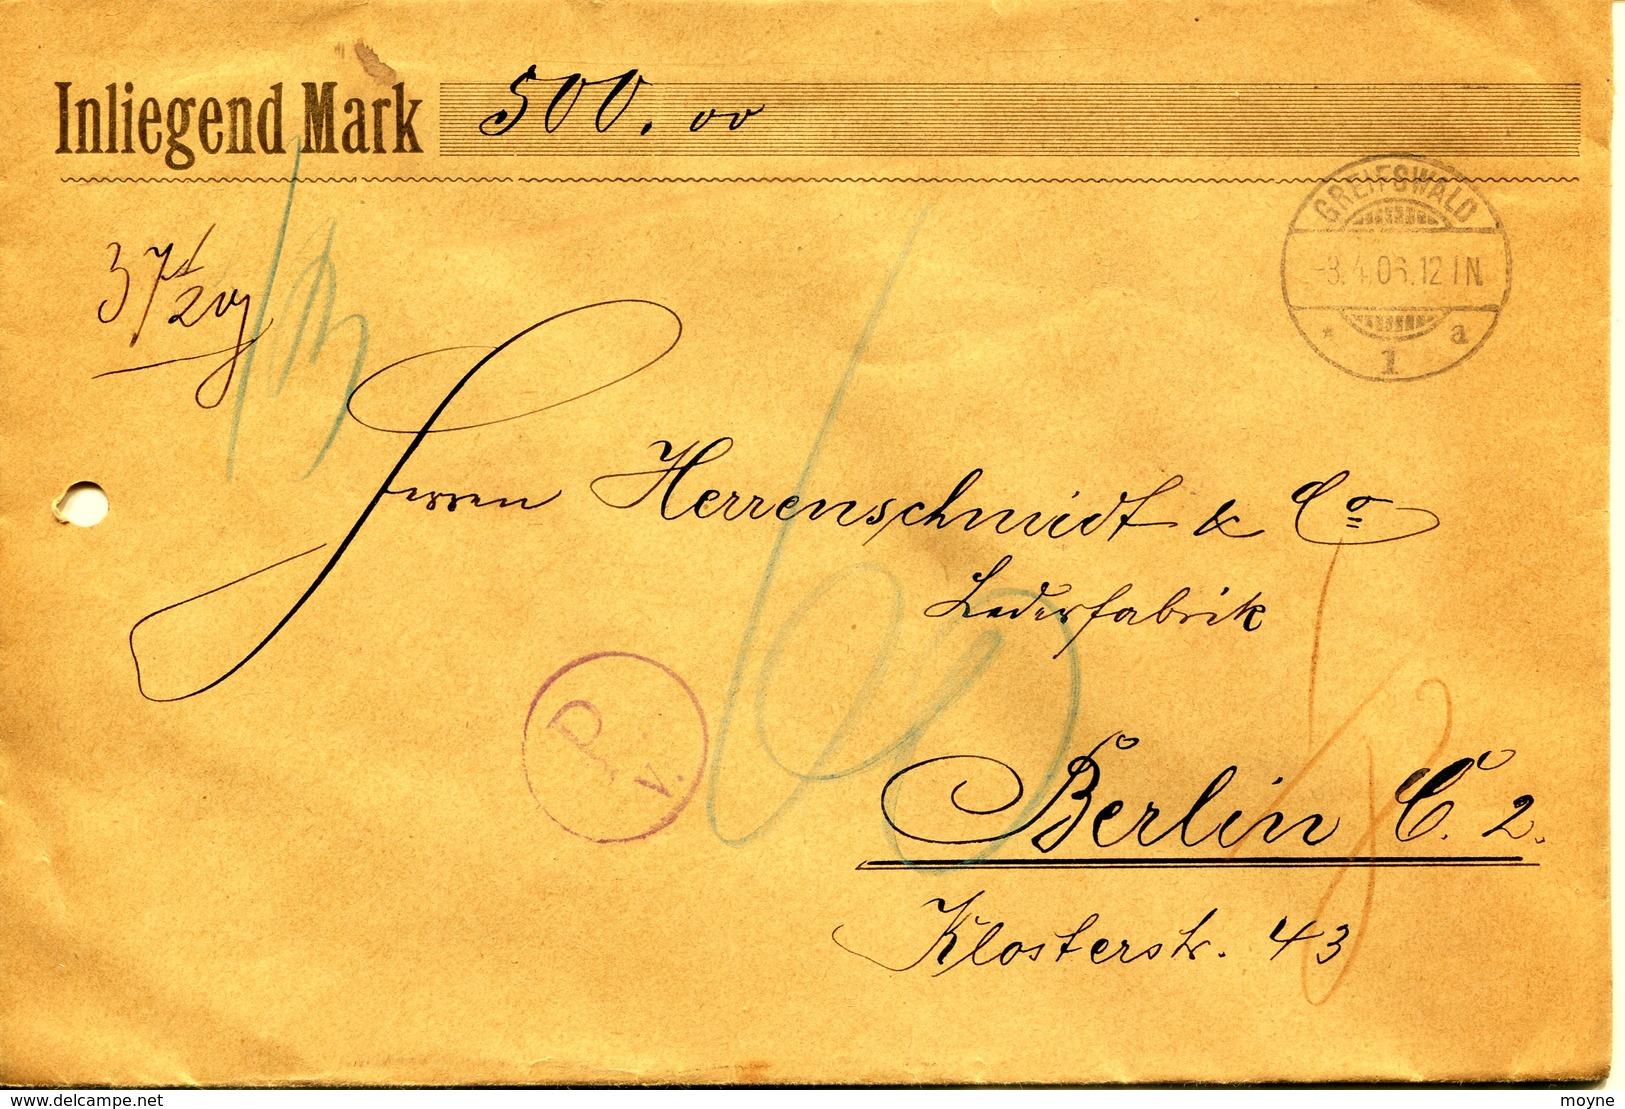 42  Allemagne - GREIFSWALD  à BERLIN   - ENVELOPPE RECOMMANDEE CHARGEE  500 Marcs  - 37,2 Grs -1906 - Deutschland